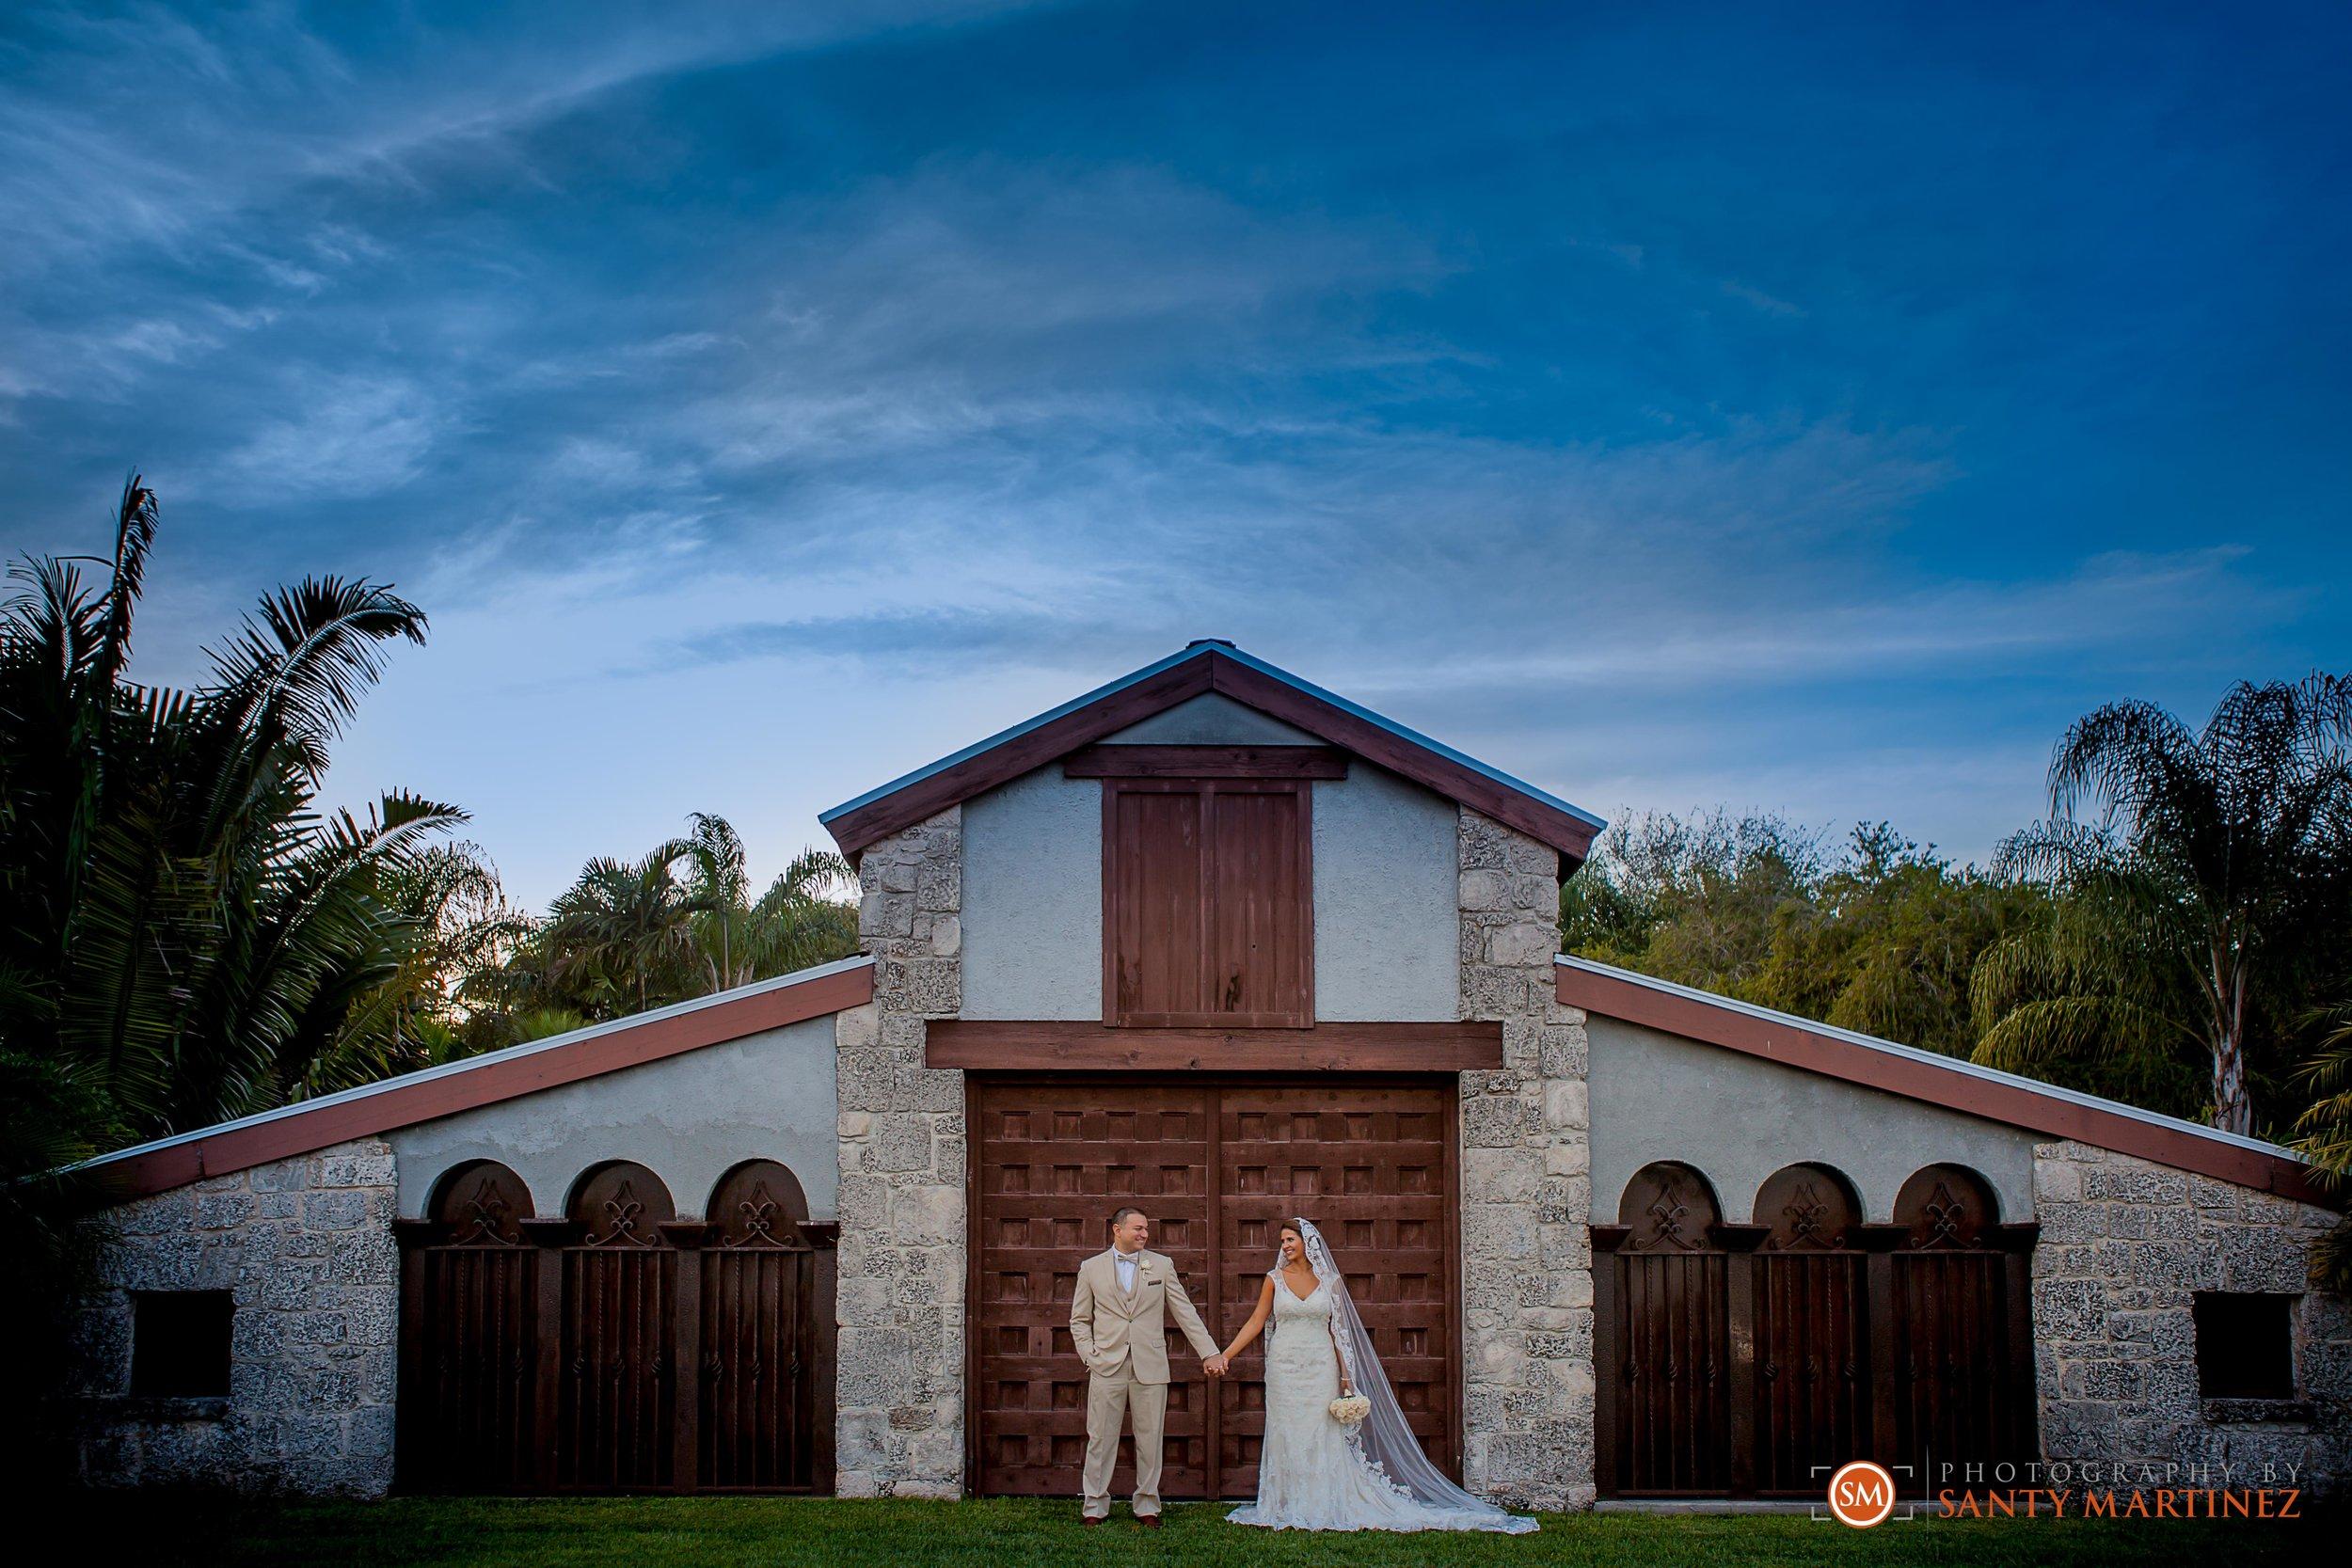 Miami Wedding Photographer - Santy Martinez--1.jpg